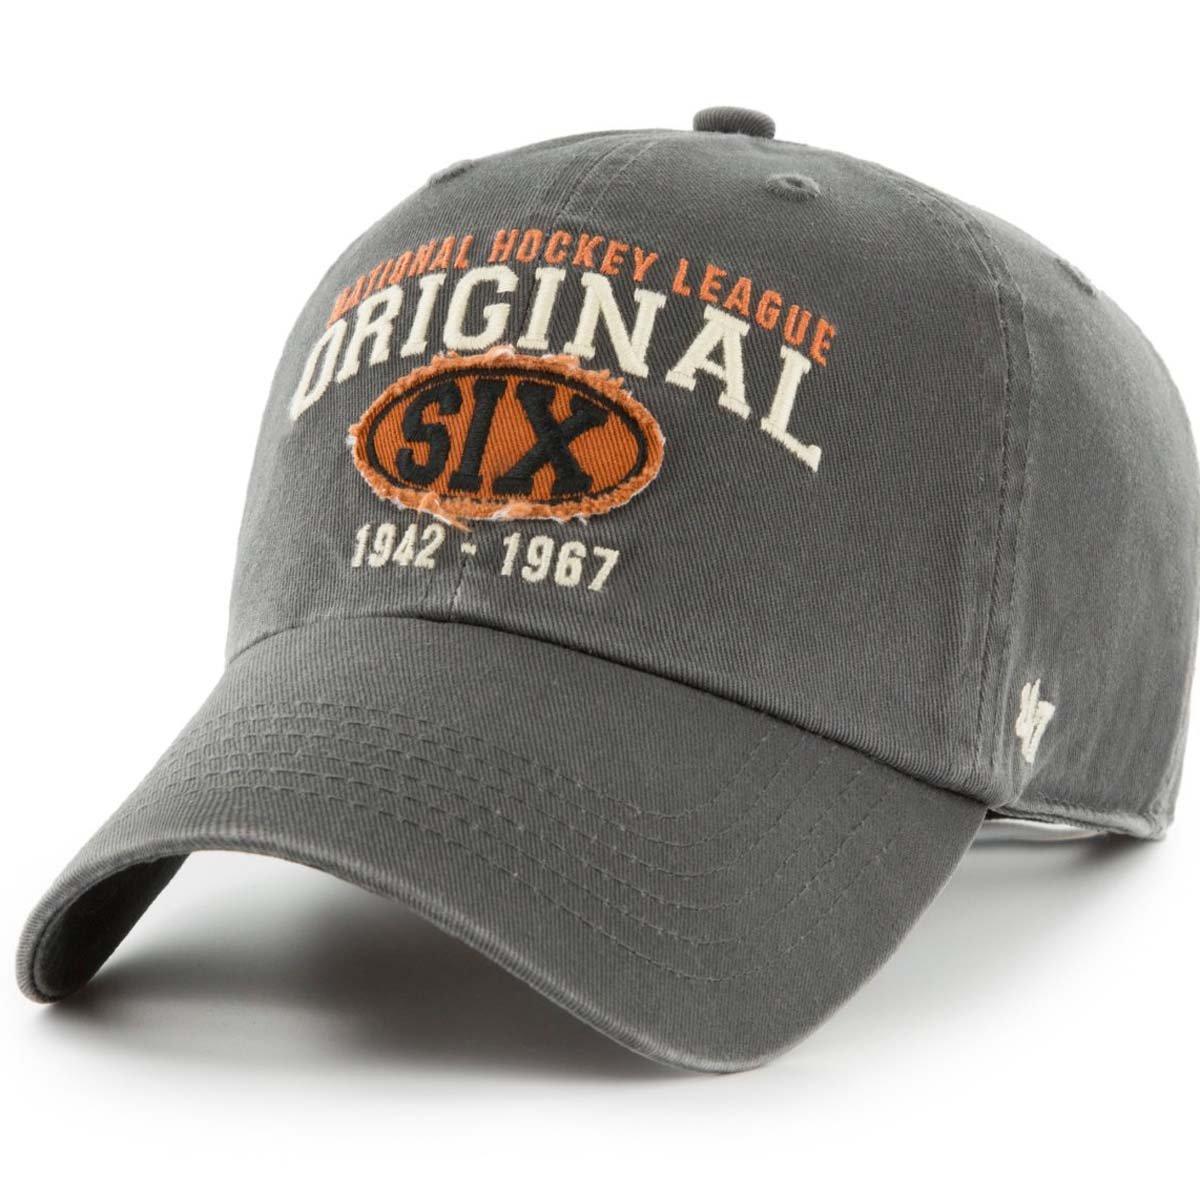 47 Brand Adjustable Cap Henrick Original Six Charcoal